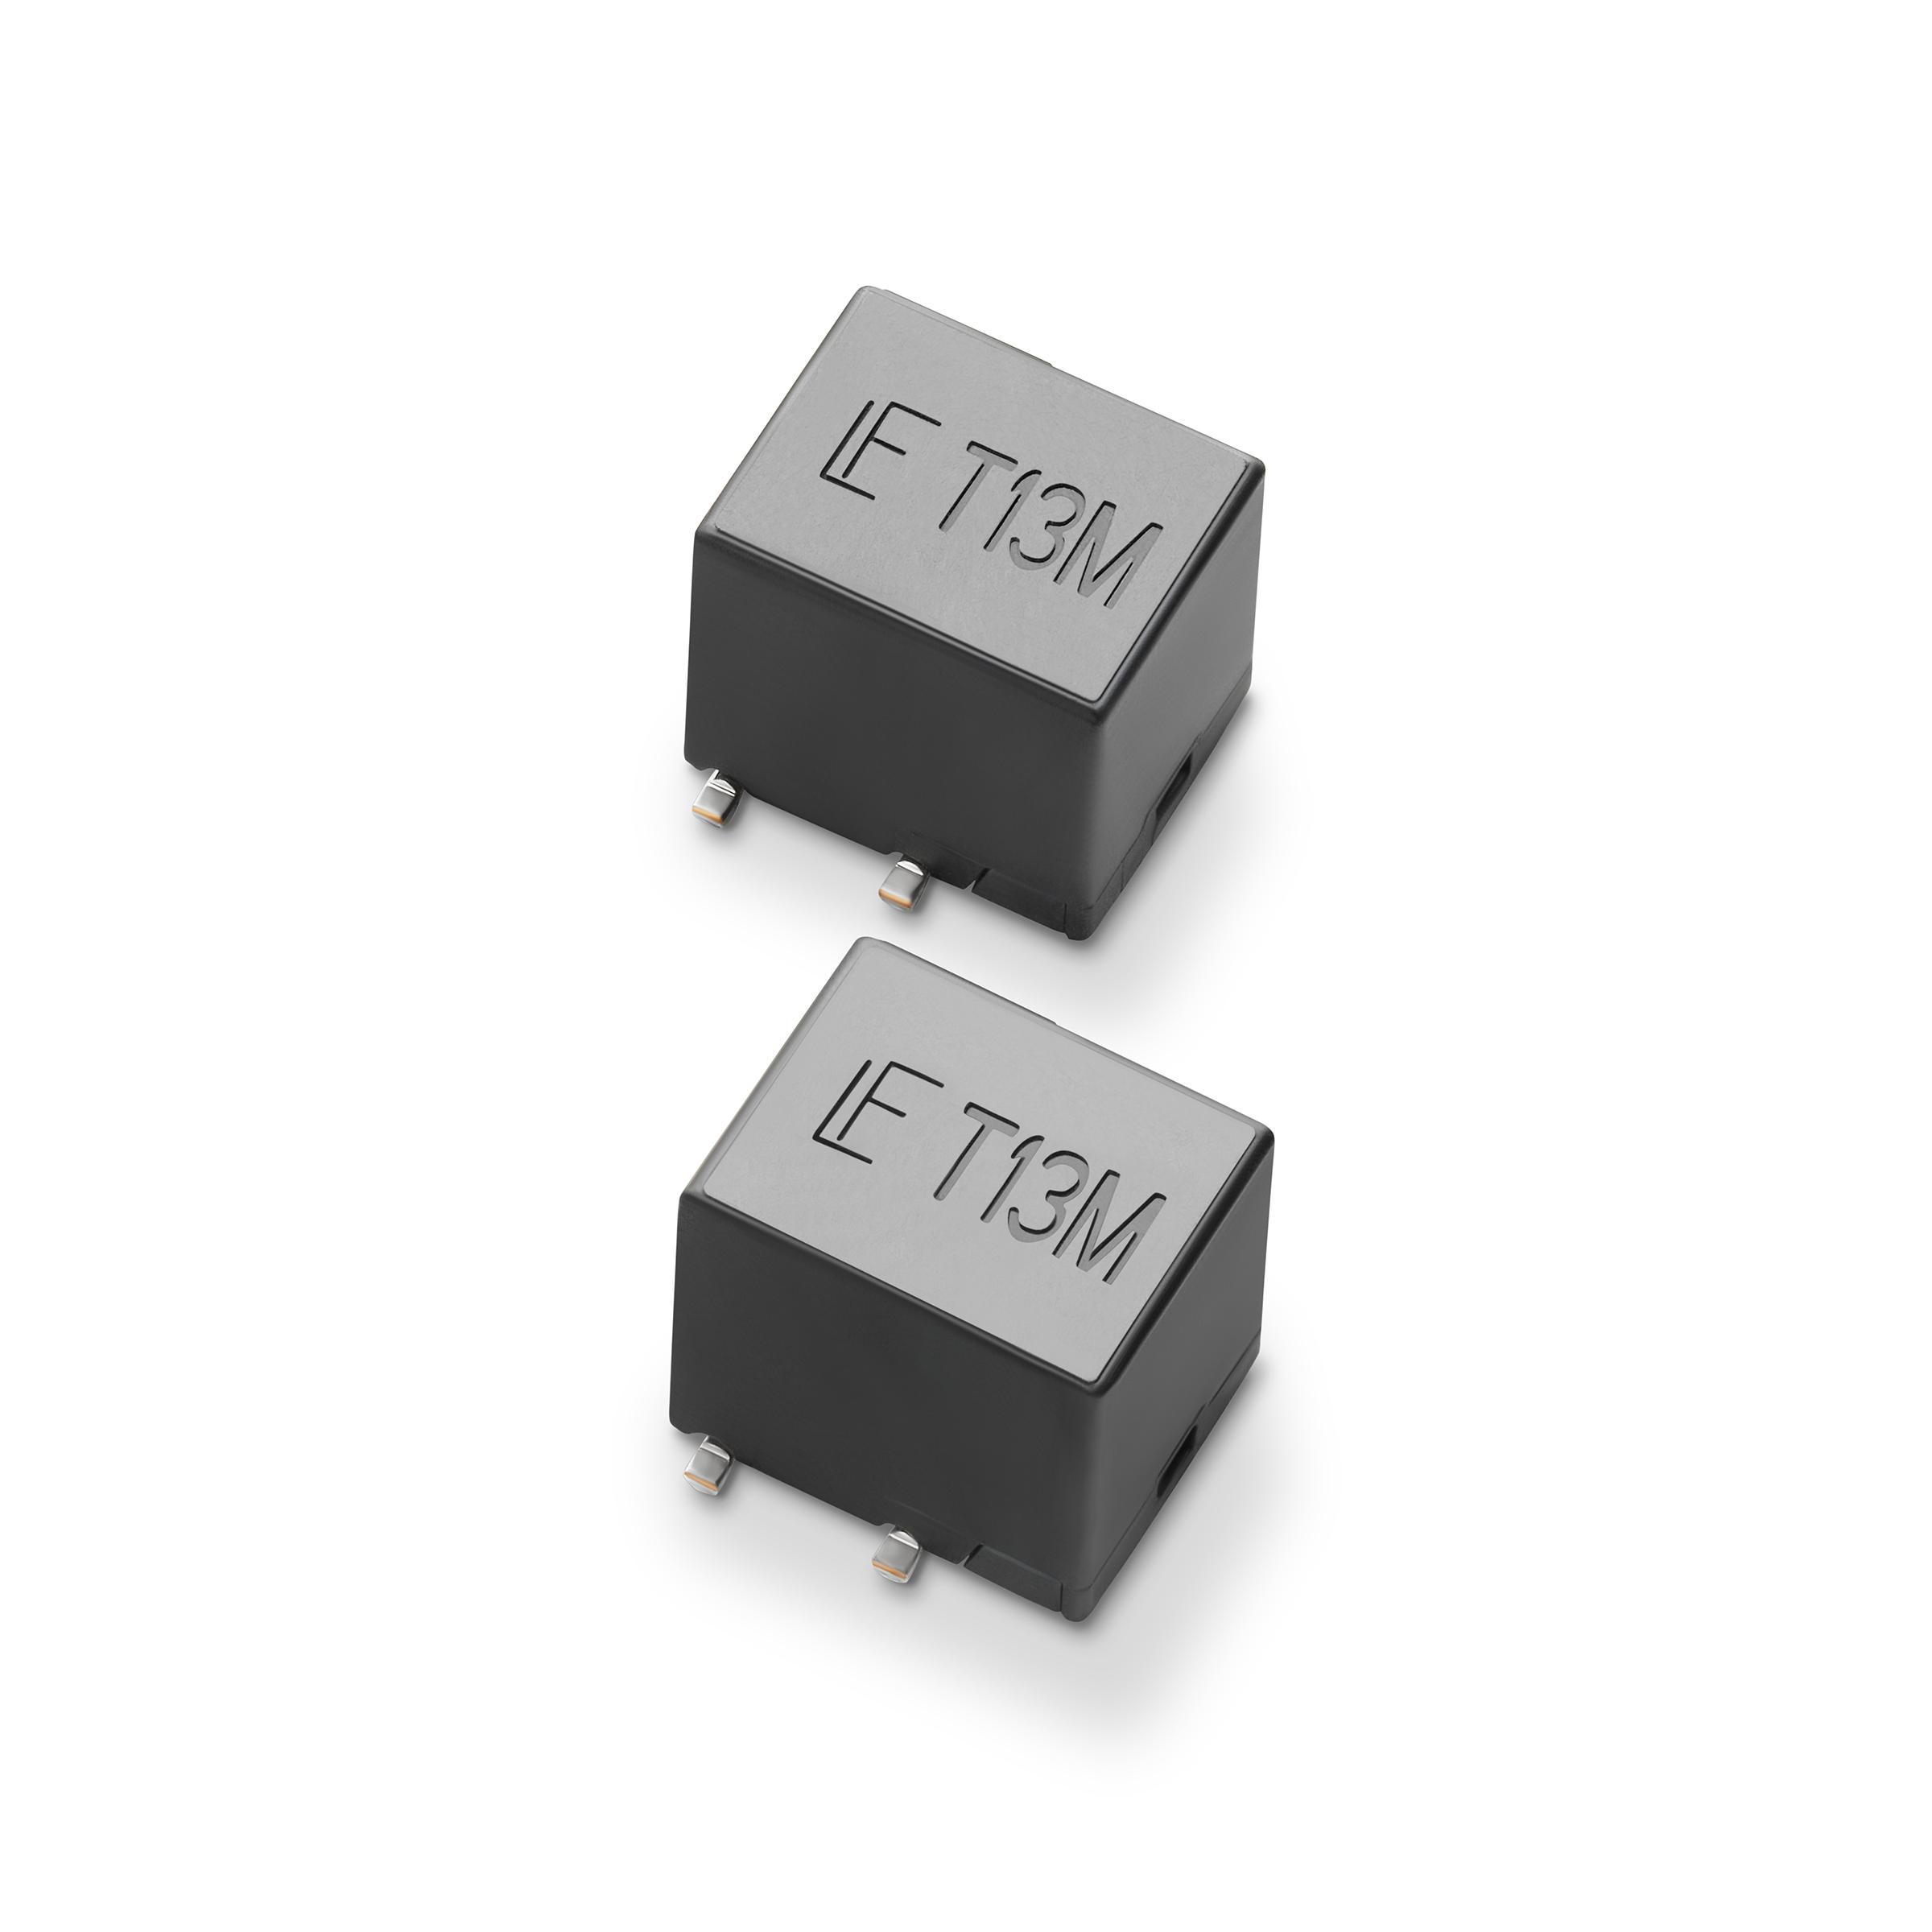 Littelfuse双通道PPTC封装尺寸缩小50%,可防止电信设备电流过载